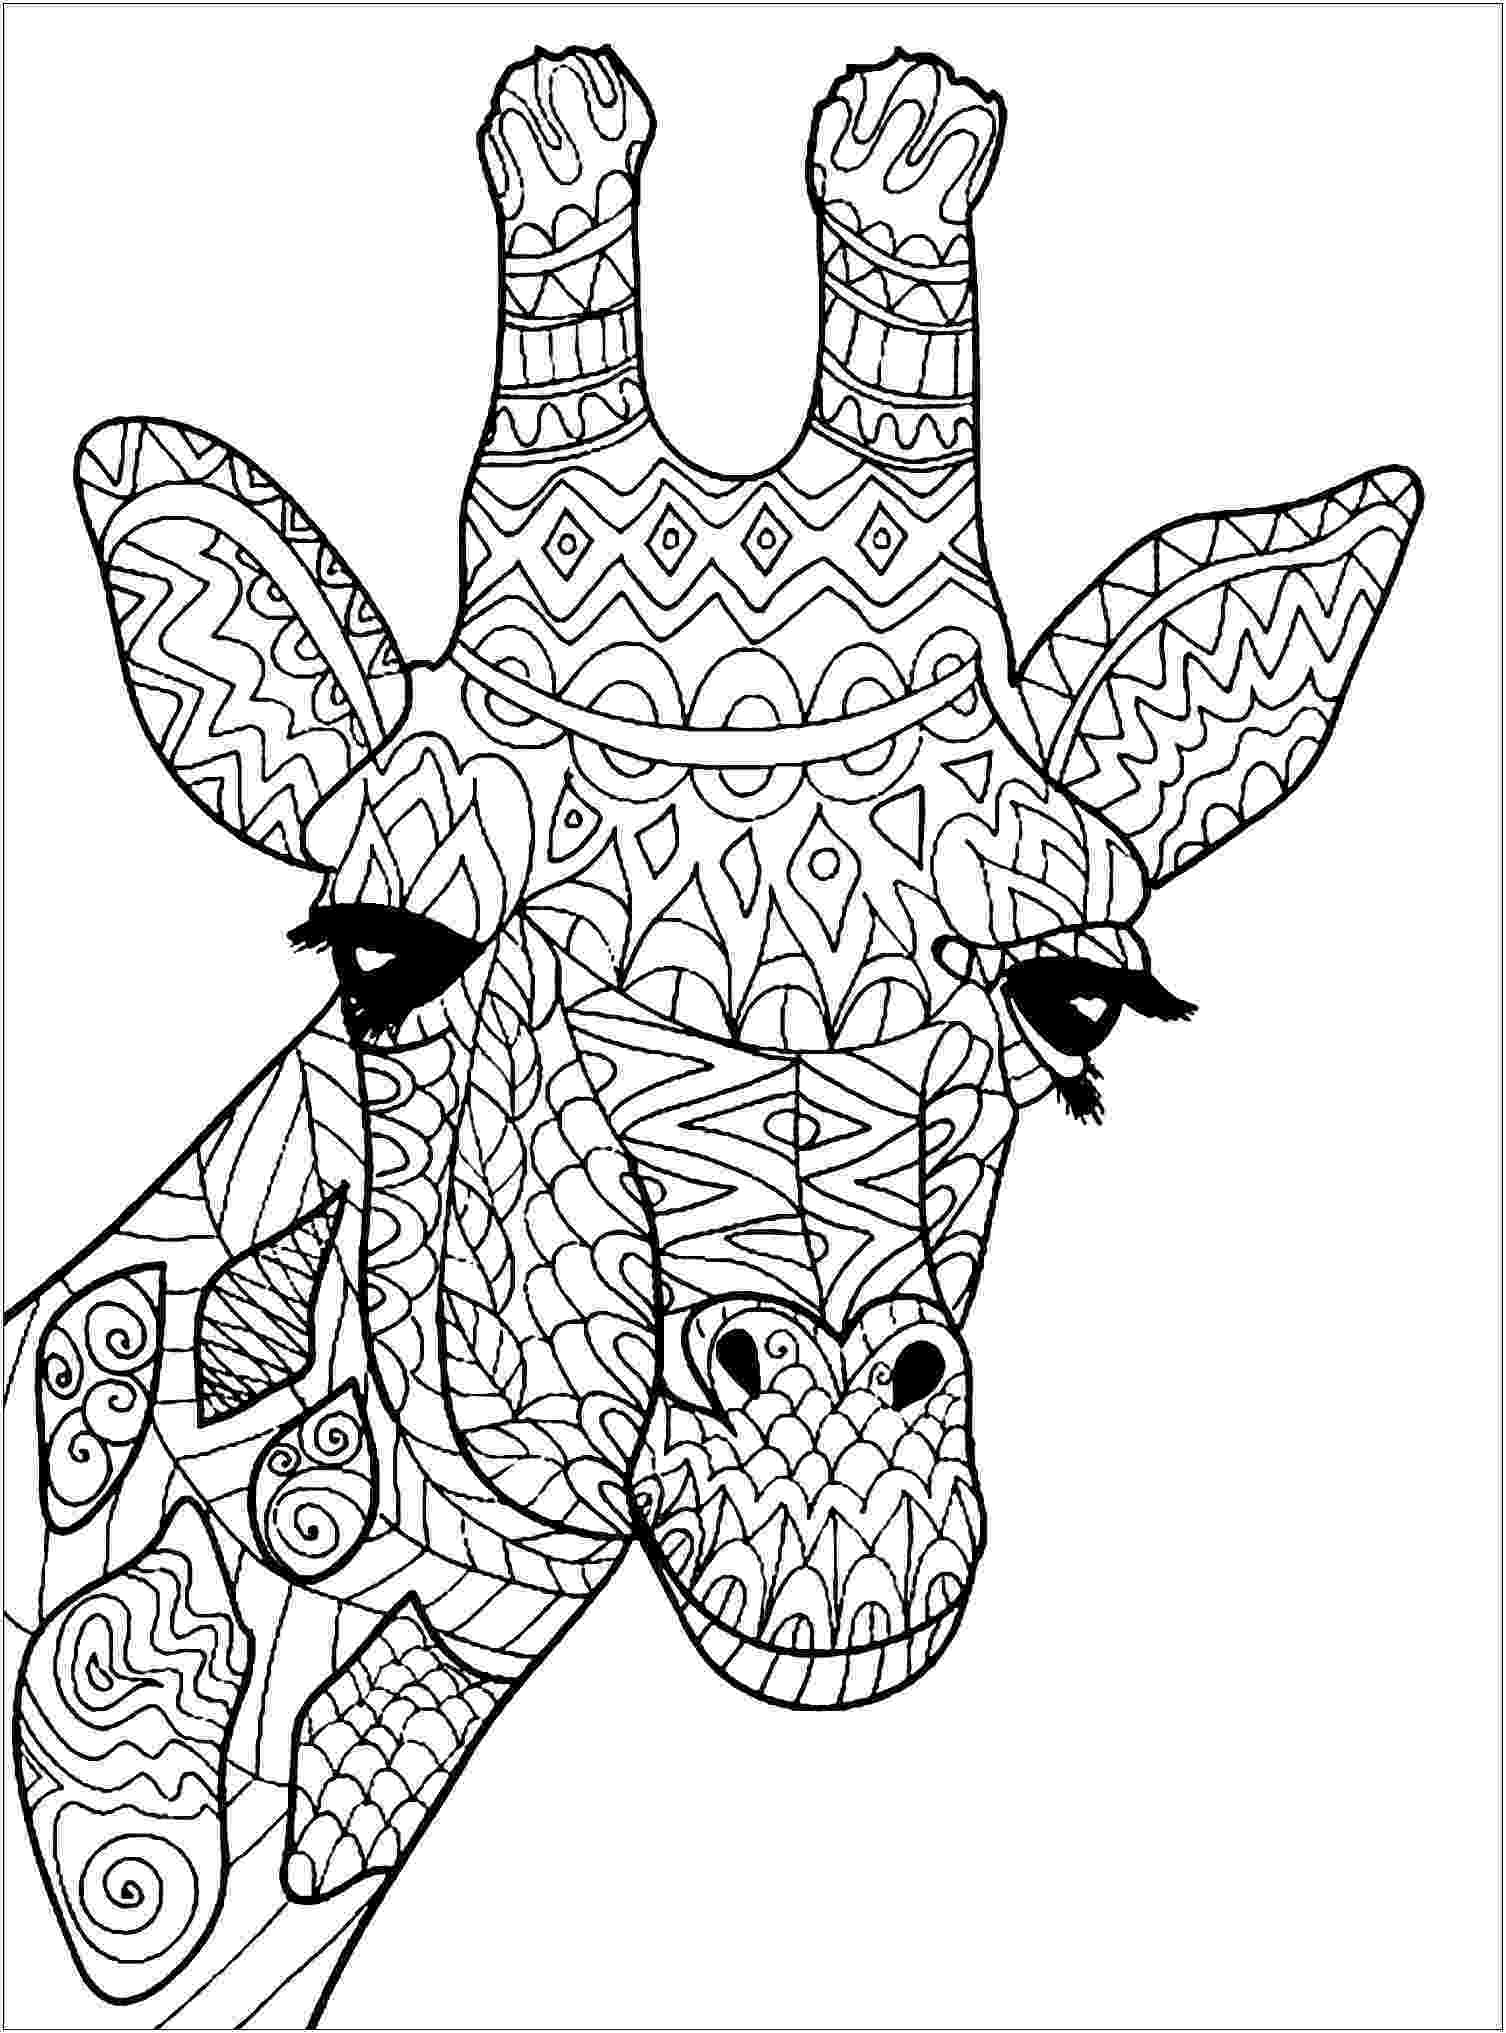 colouring pages for giraffe giraffe head giraffes adult coloring pages colouring pages for giraffe